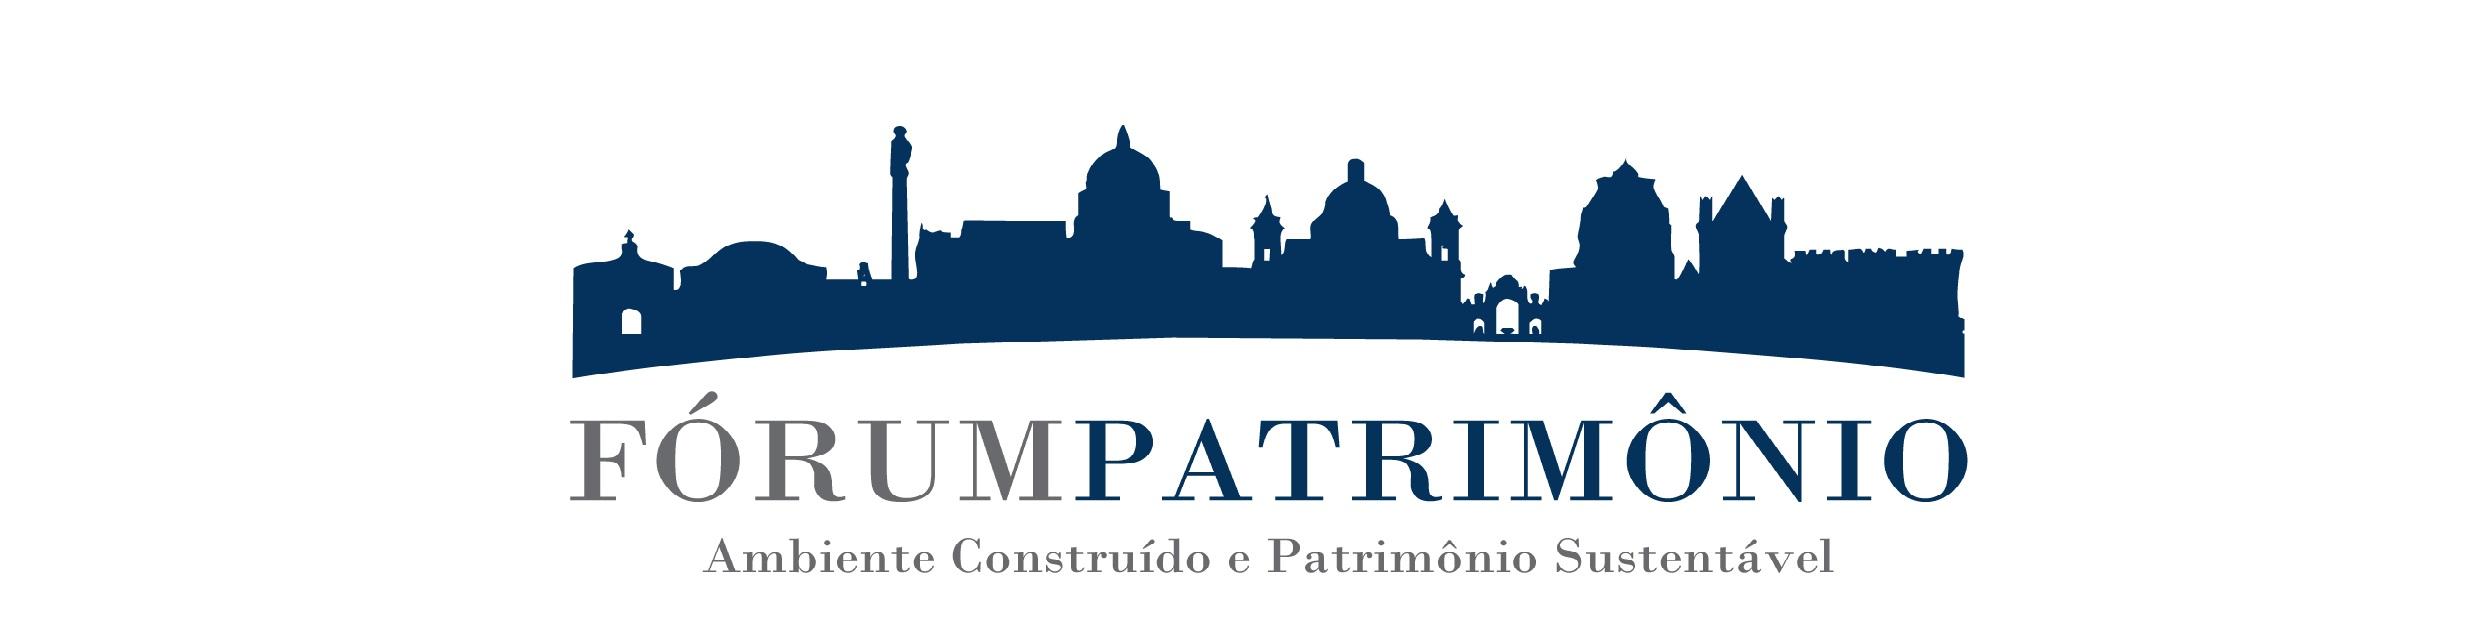 Revista Forum Patrimônio